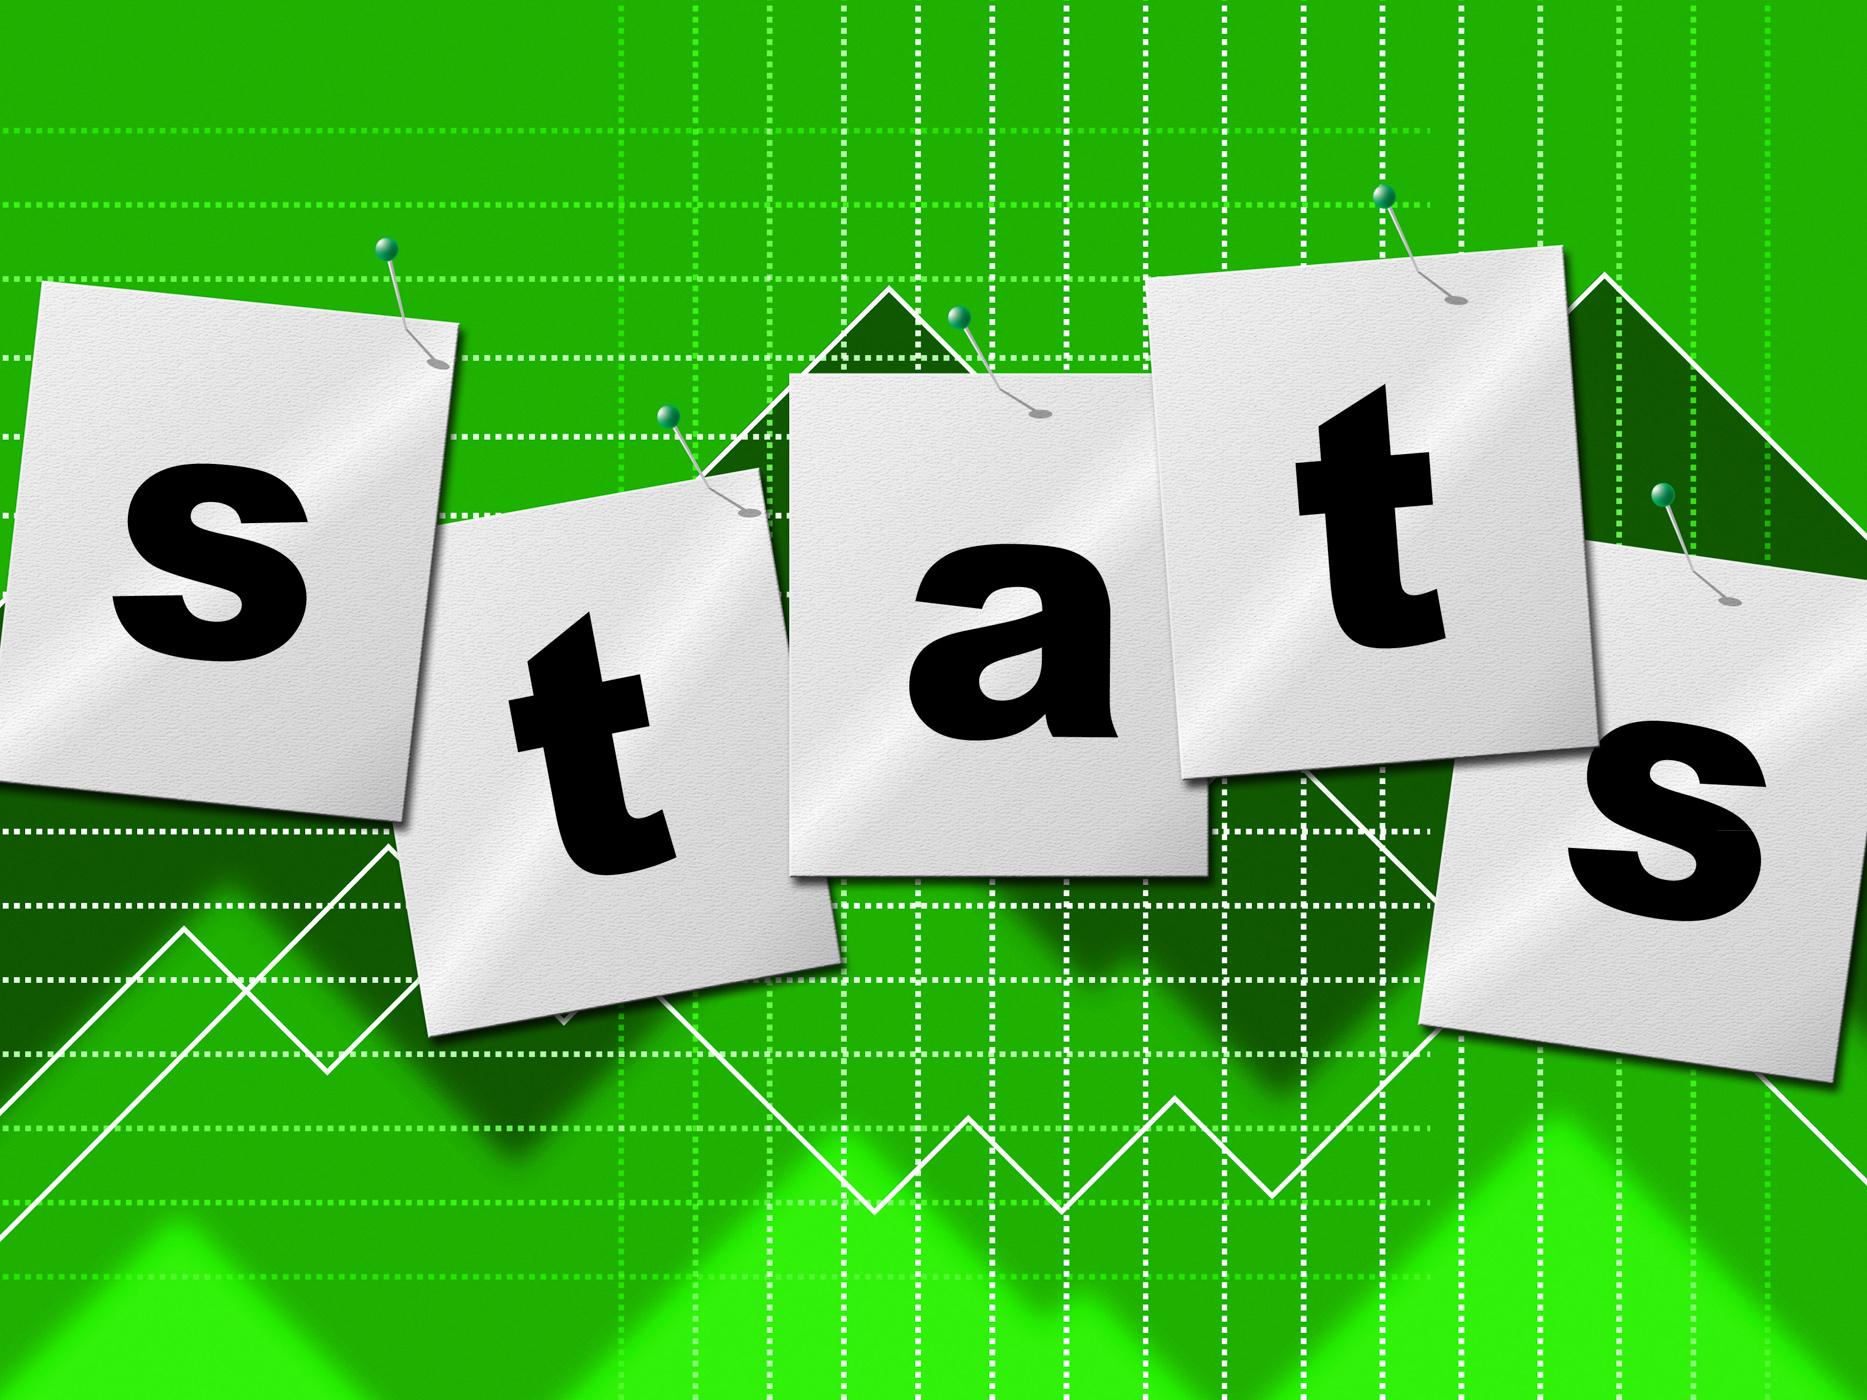 Statistics data indicates stats bytes and reports photo